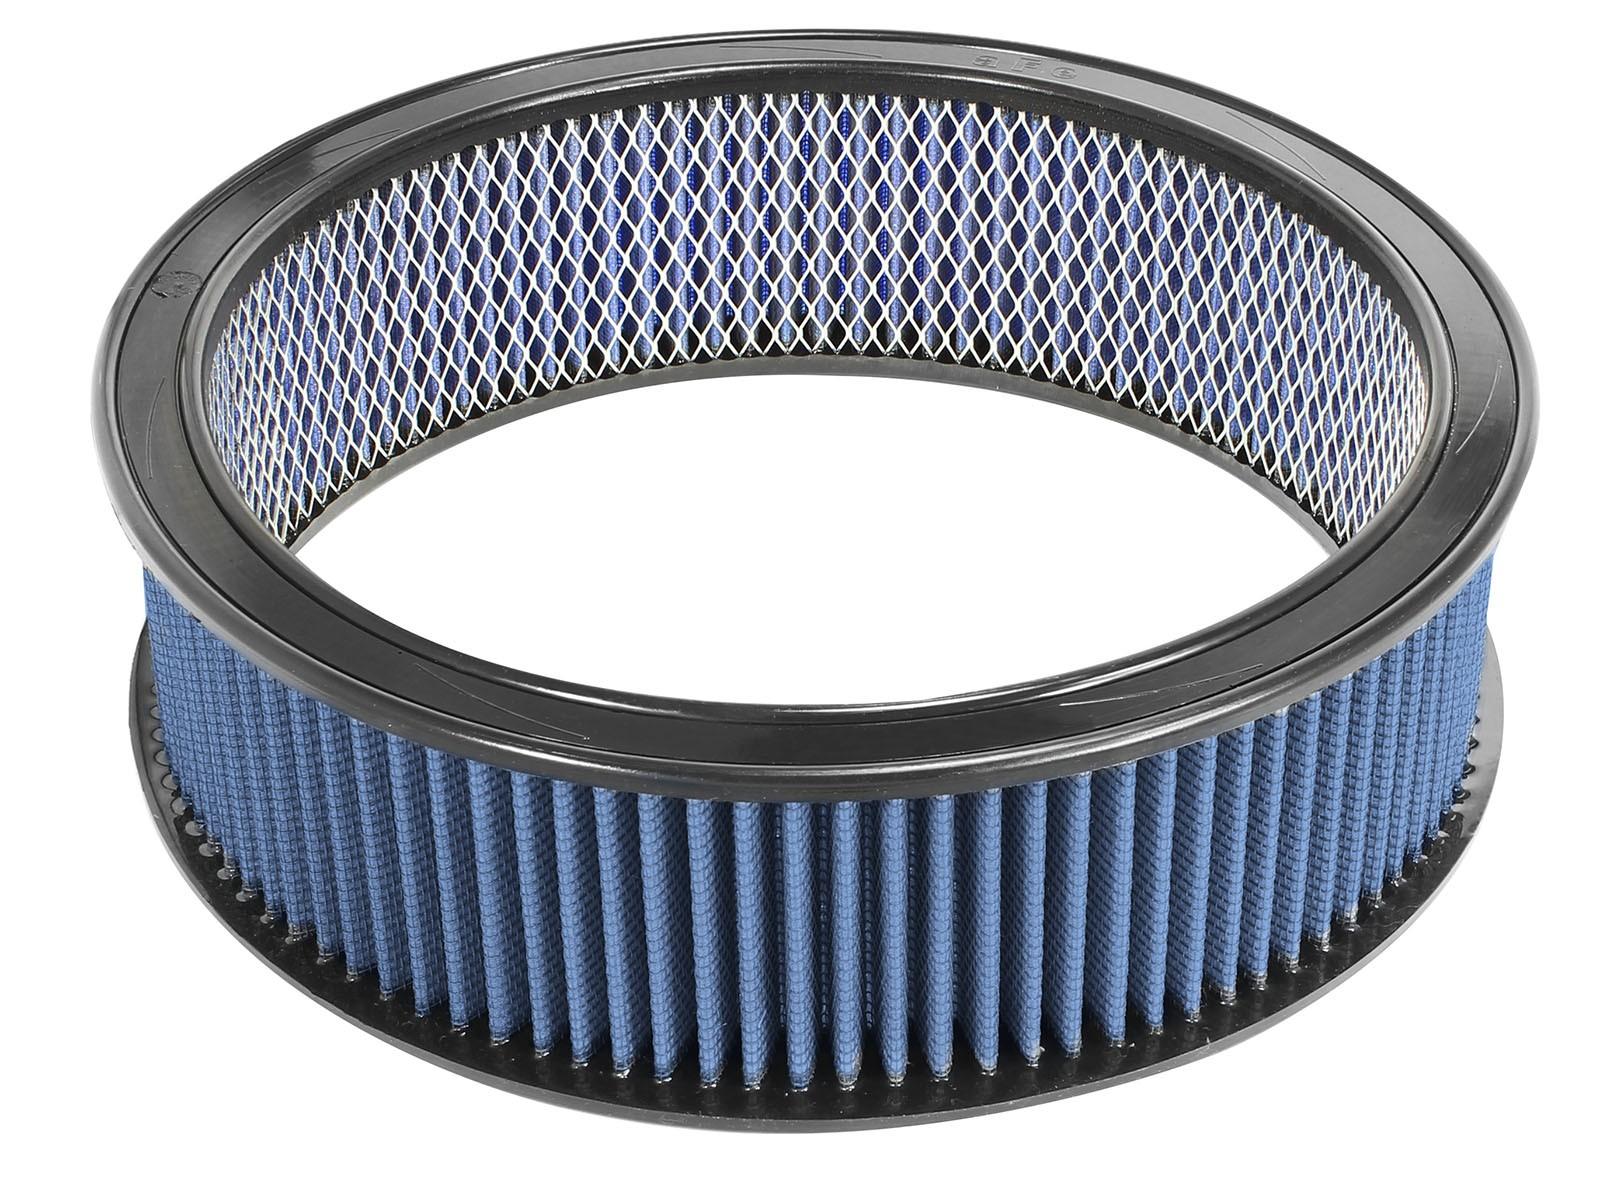 aFe POWER 18-11602 Round Racing Pro 5R Air Filter